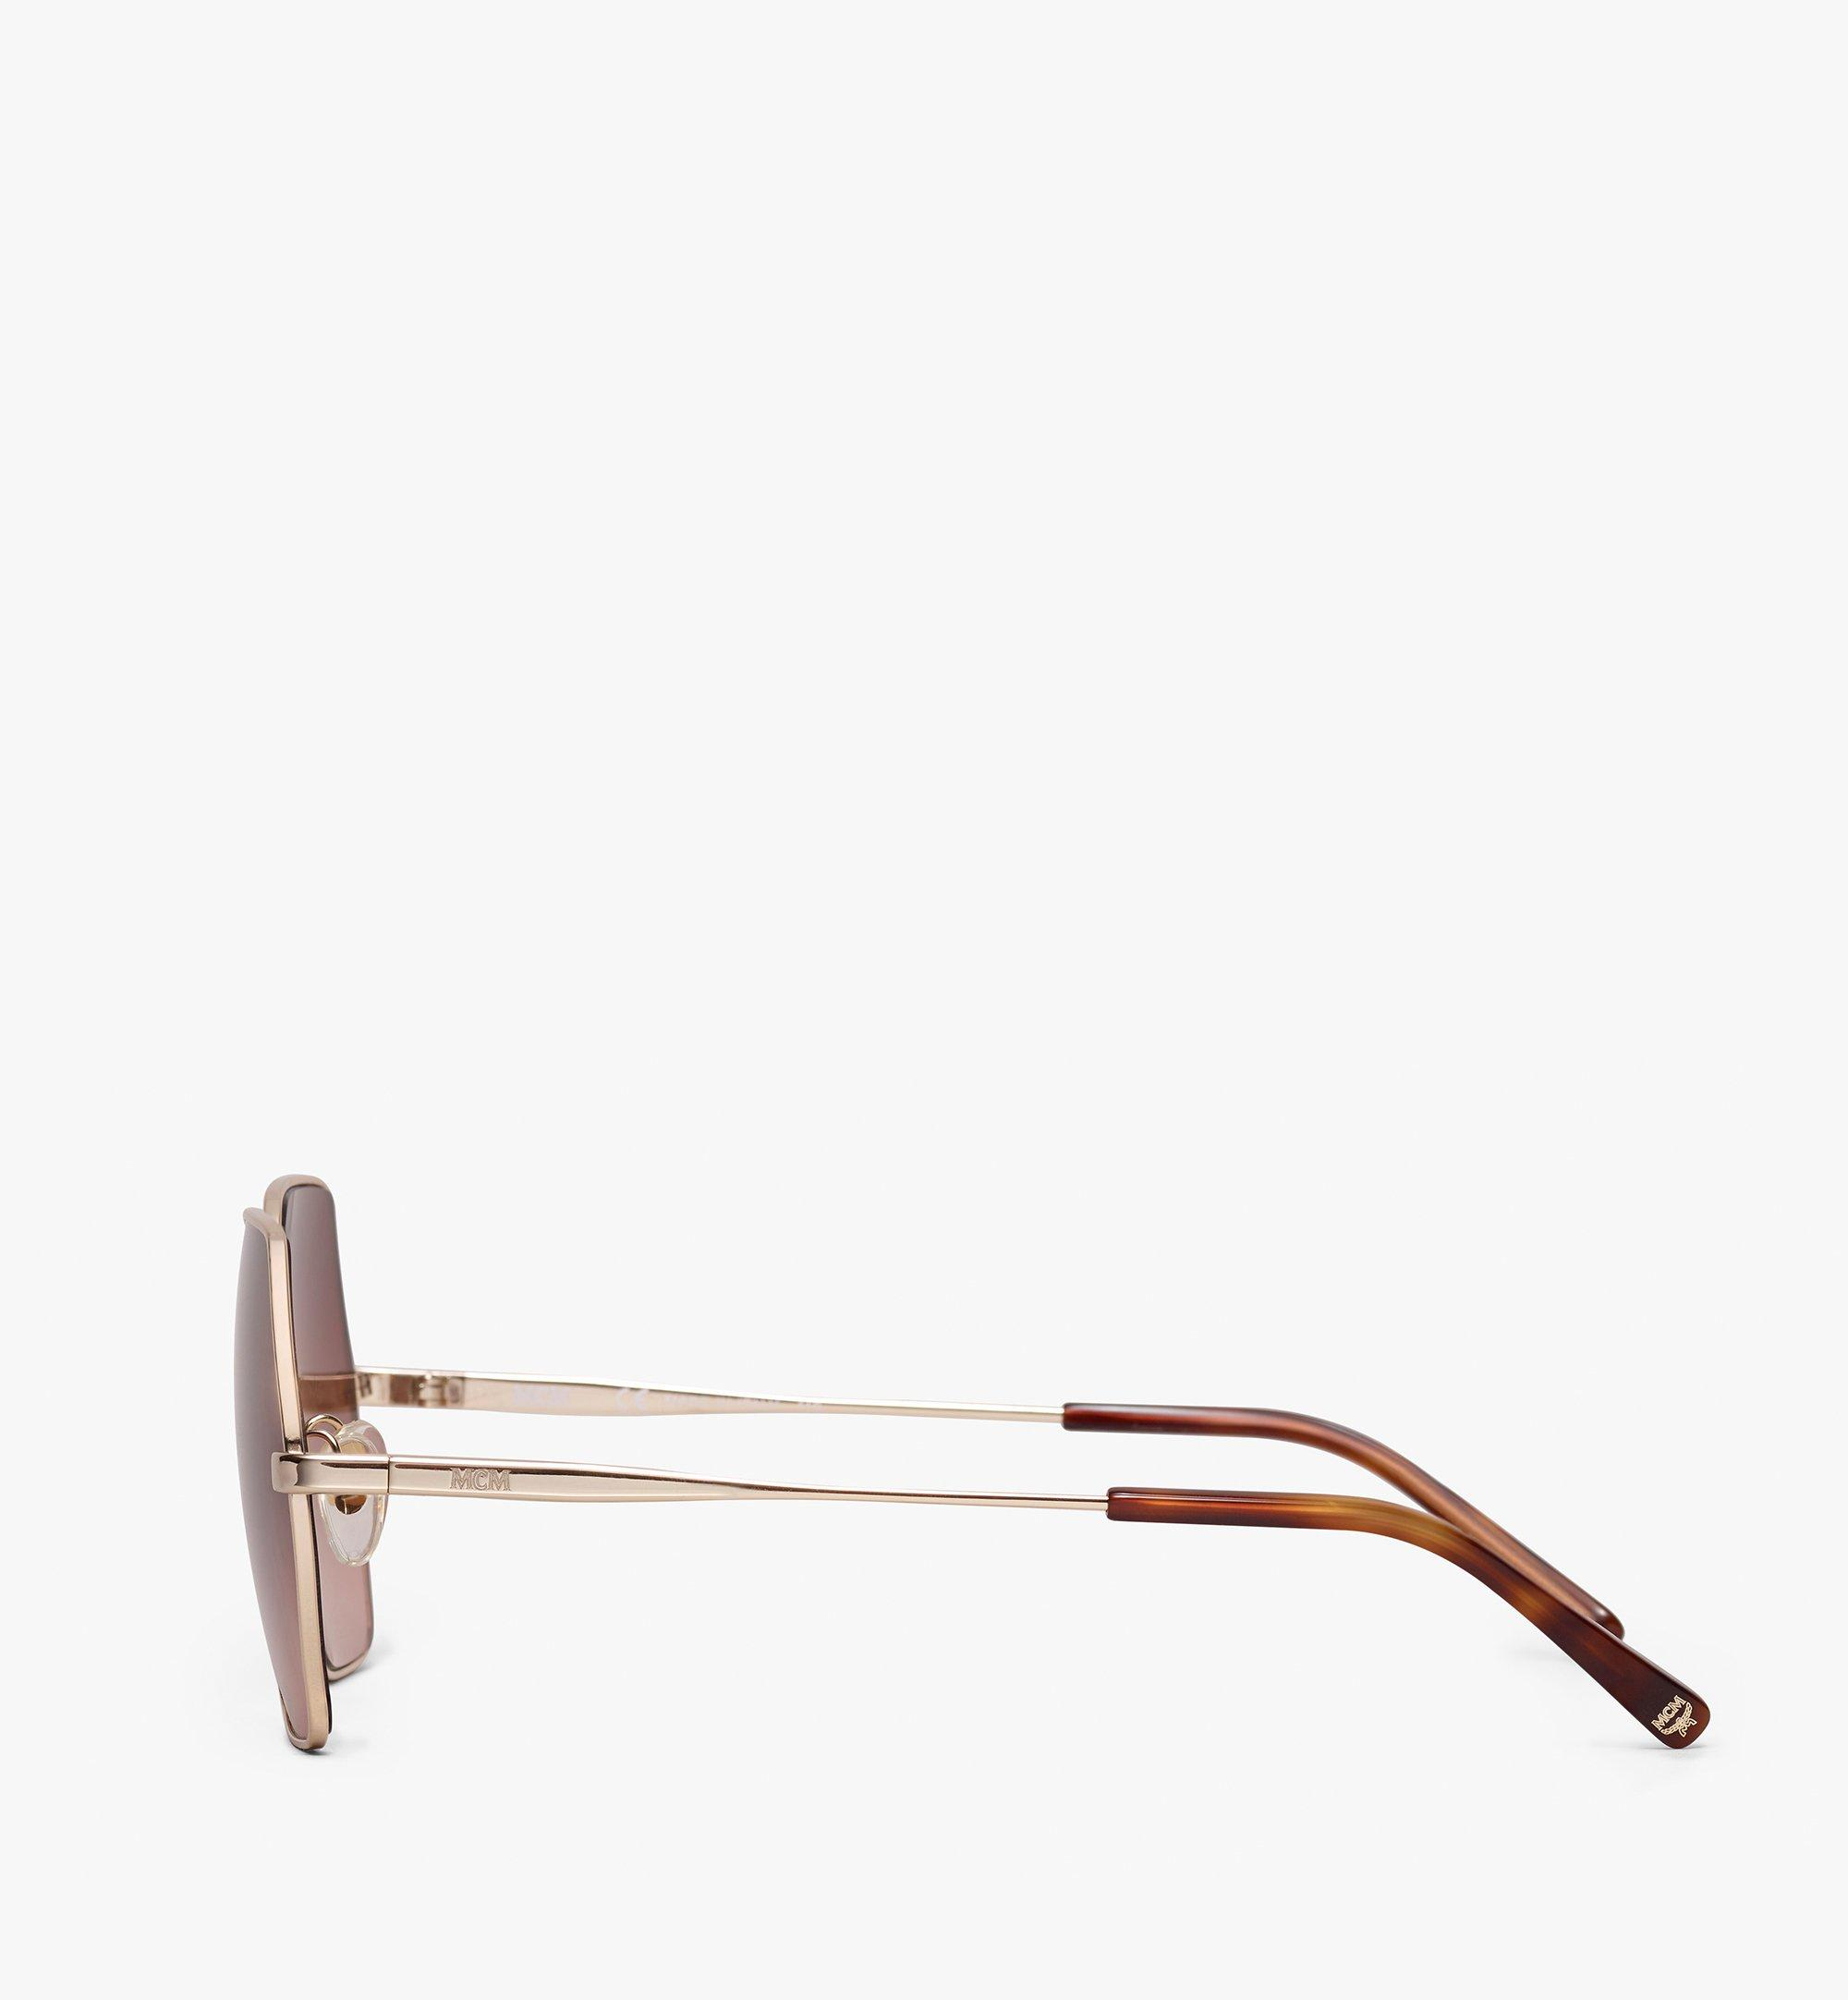 MCM Geometric Oversized Sunglasses Brown MEG9A2I06NR001 Alternate View 1